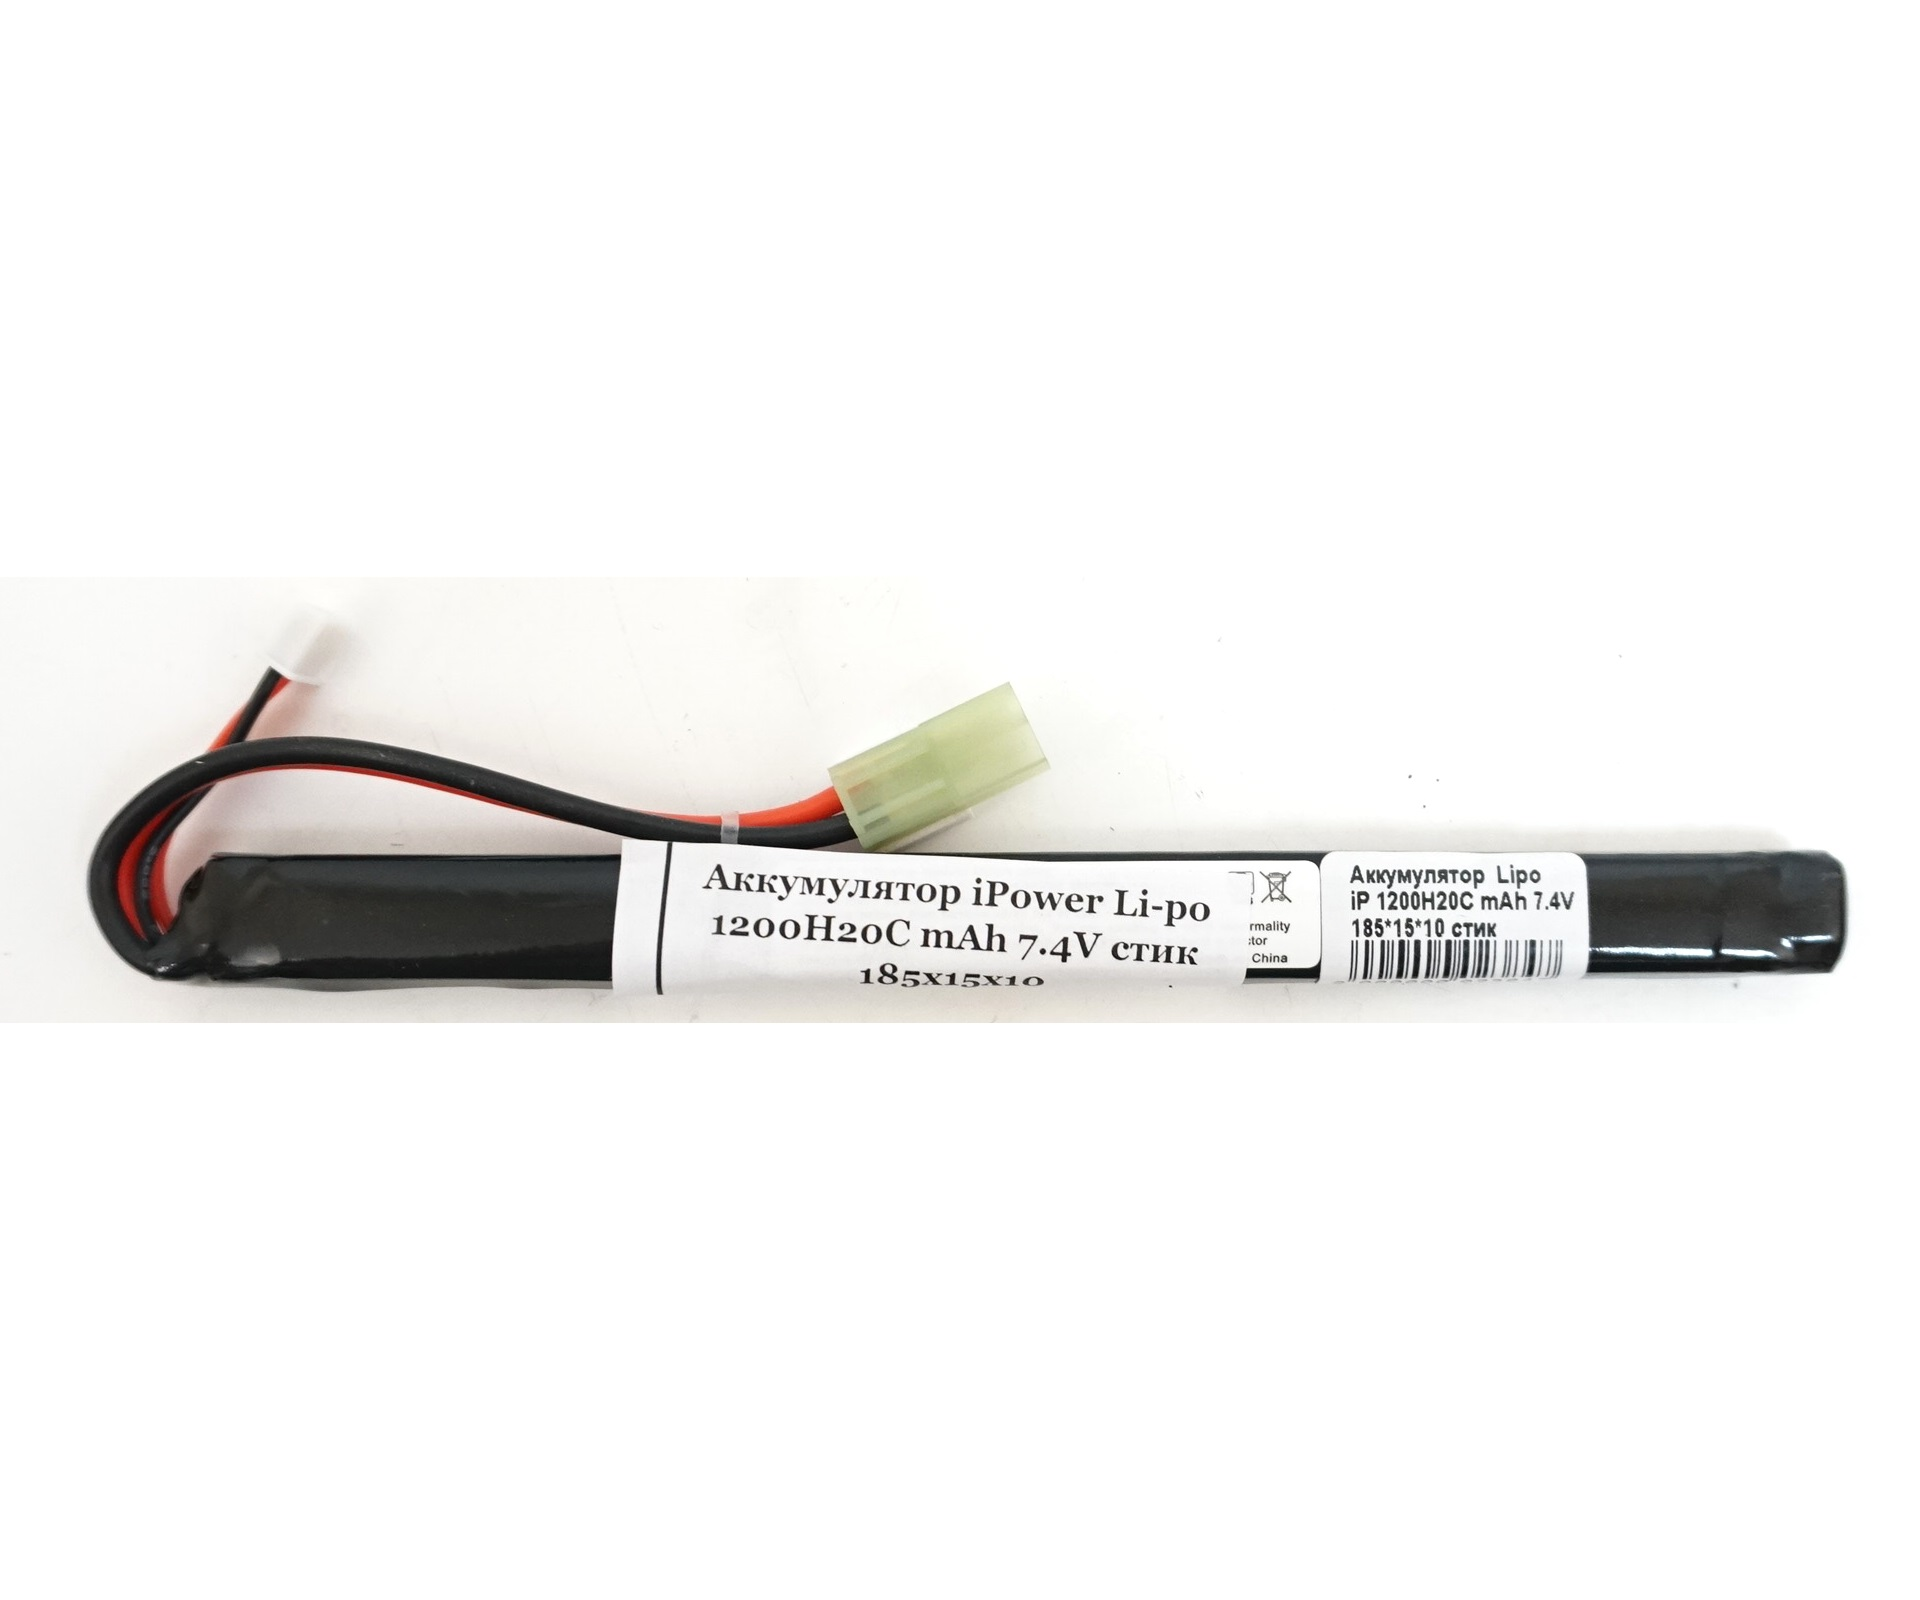 Аккумулятор iPower Li-po 7.4V 1200mAh 20C, 185x15x10 мм (стик)